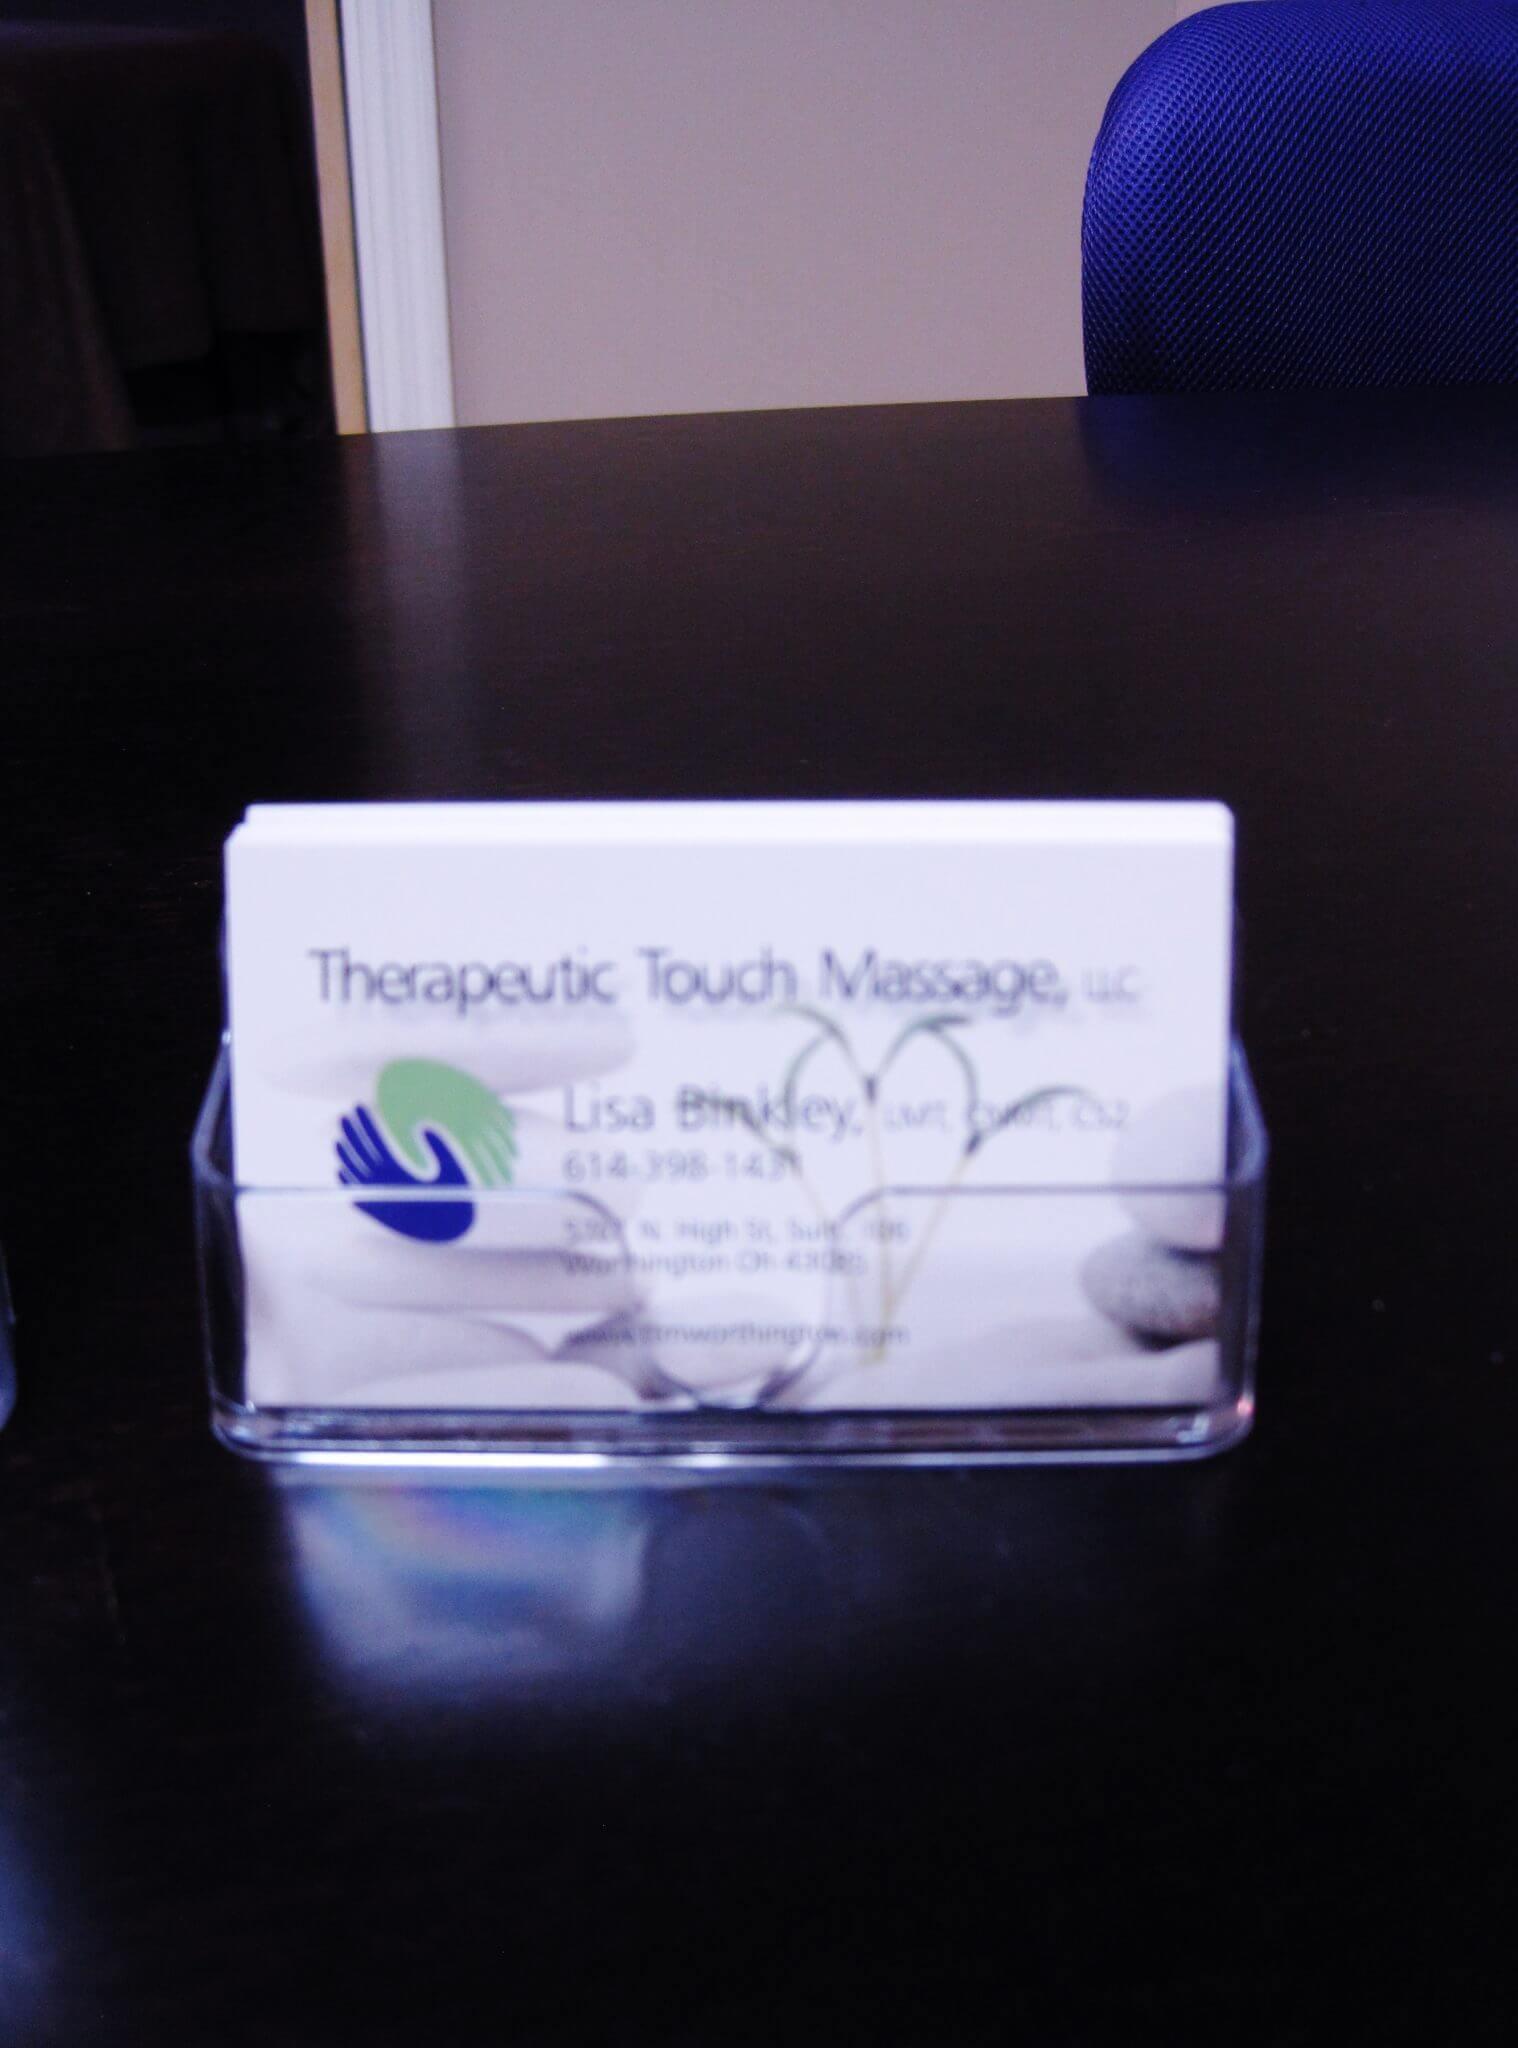 AIAM Alumni and Licensed Massage Therapist Lisa Binkley